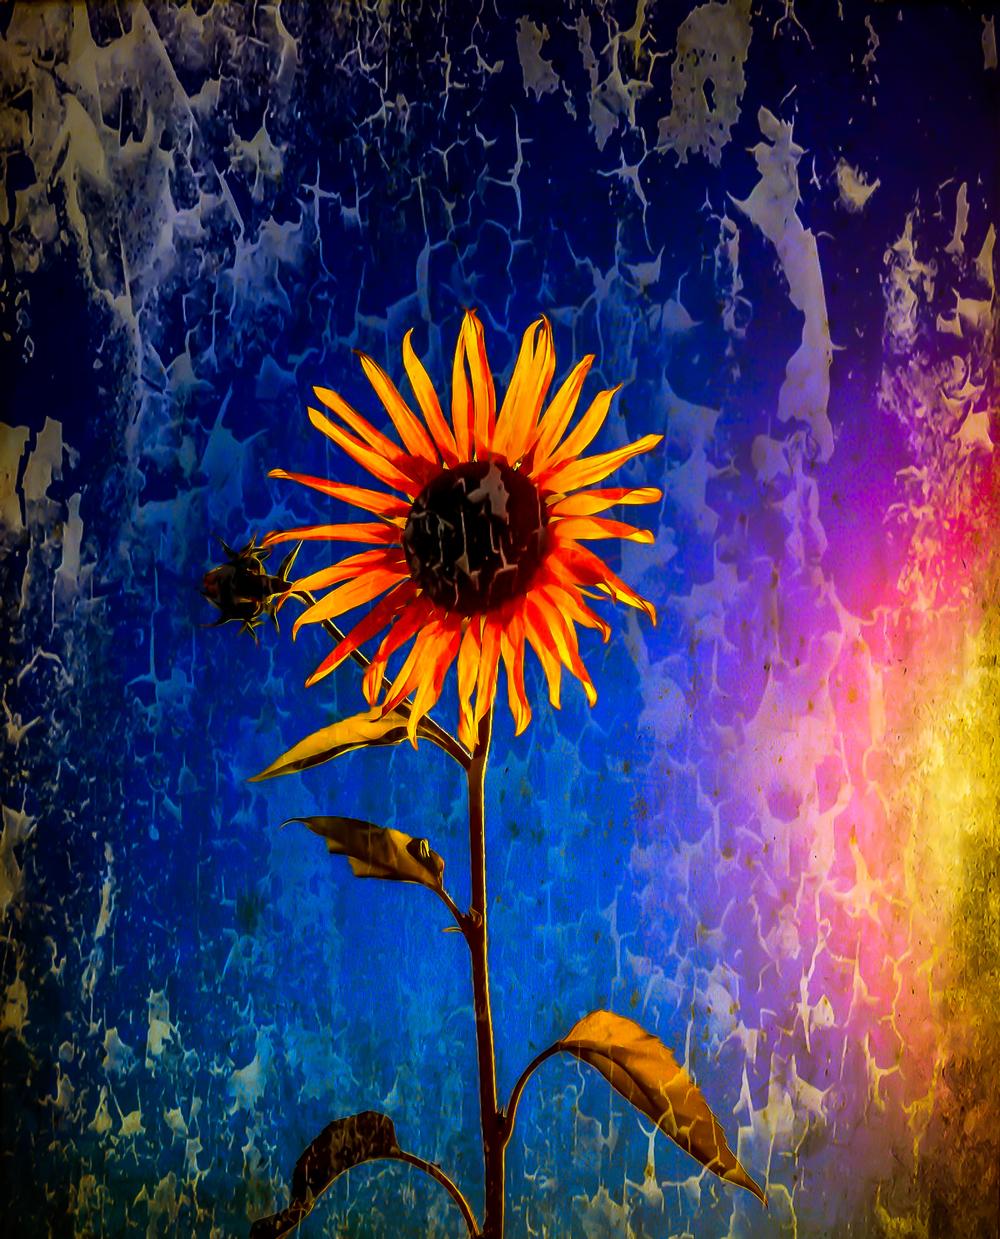 Sunflowers, Spokane Valley, Washington